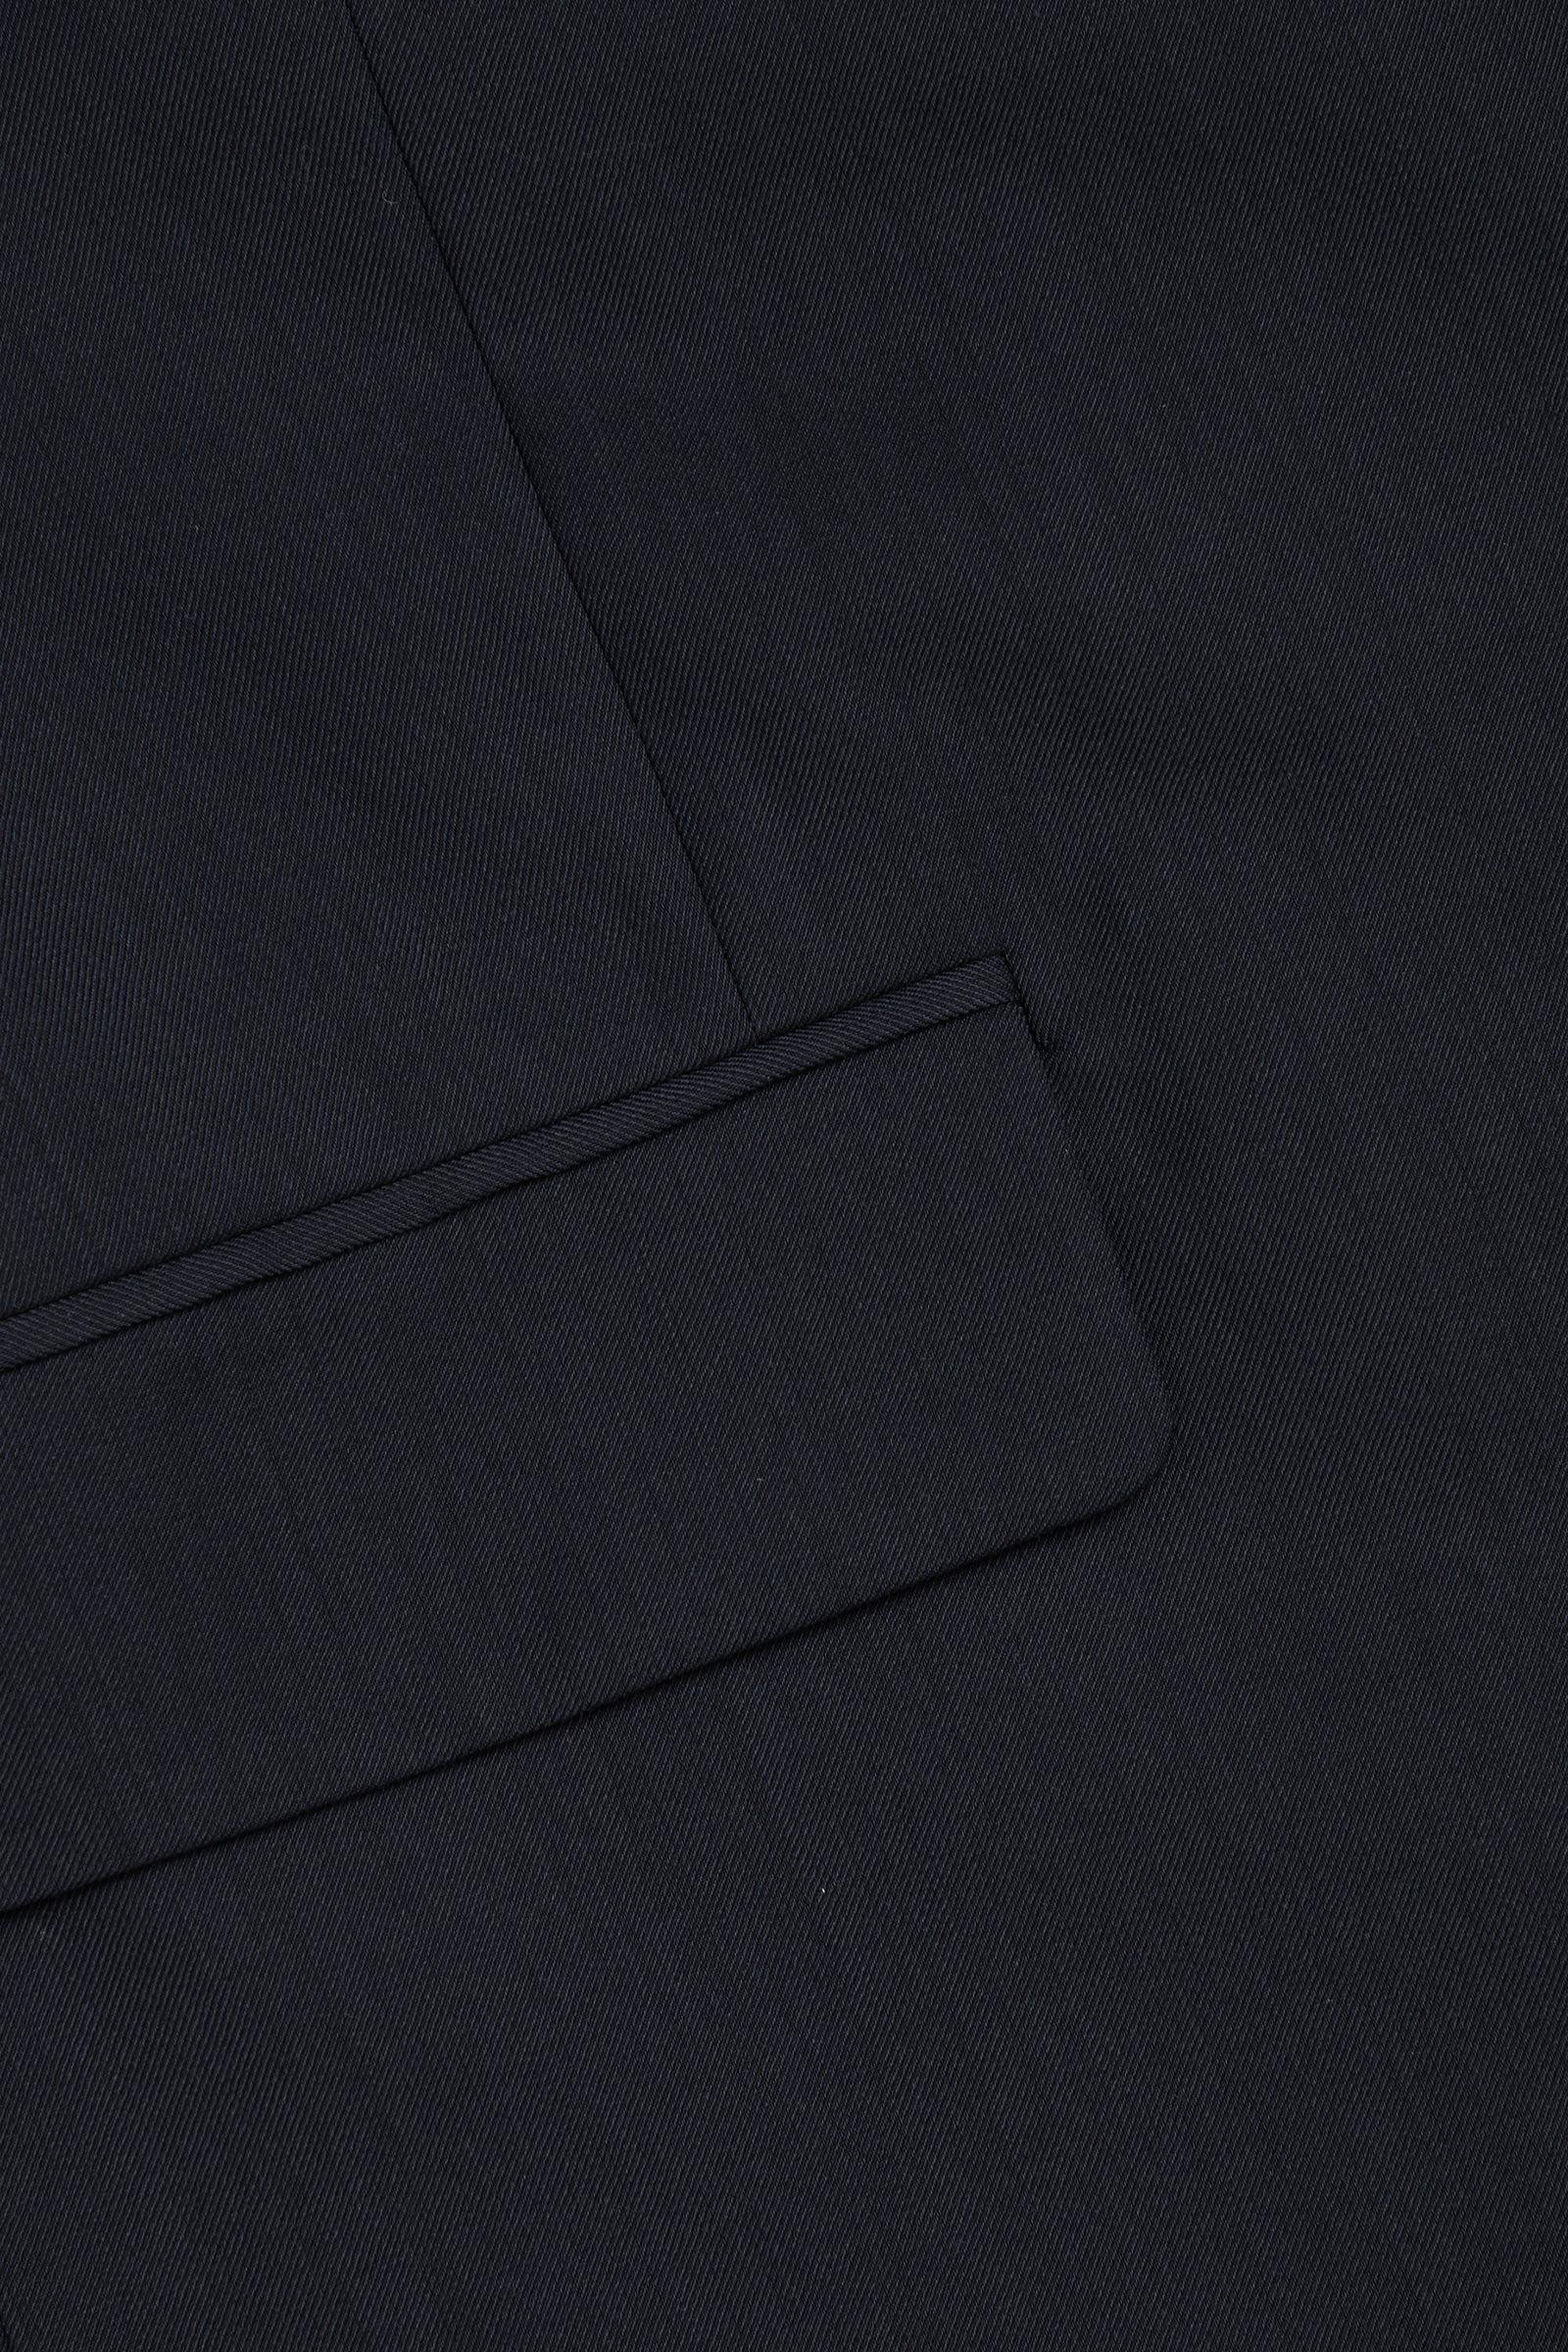 COS 슬리브리스 울 믹스 블레이저의 네이비컬러 Detail입니다.